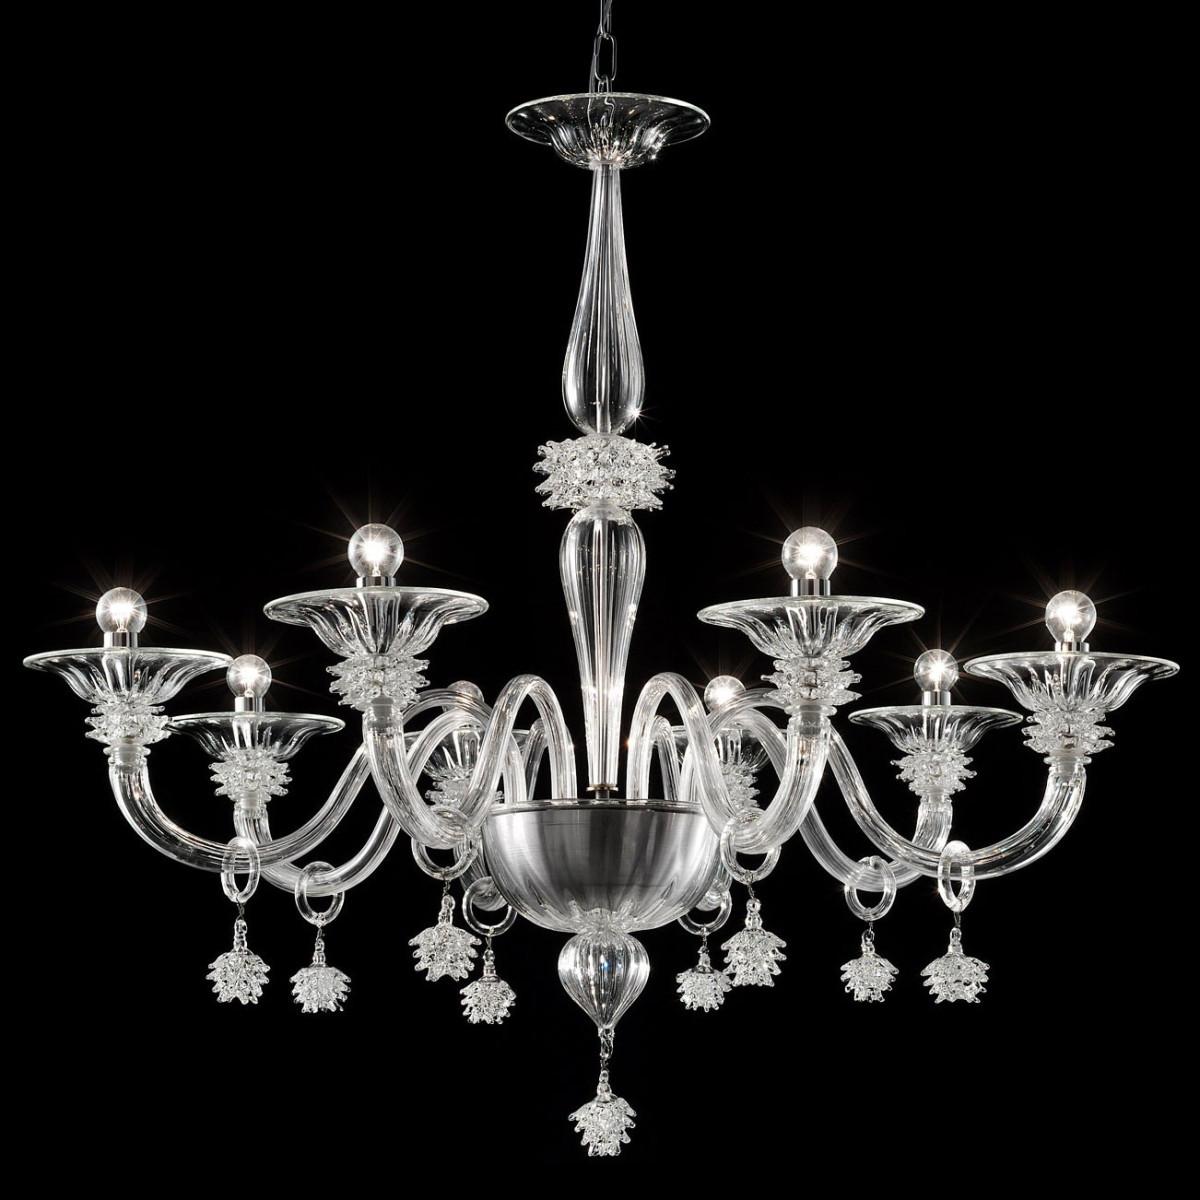 """Magellano"" Murano glas Kronleuchter - 8 flammig - transparent"